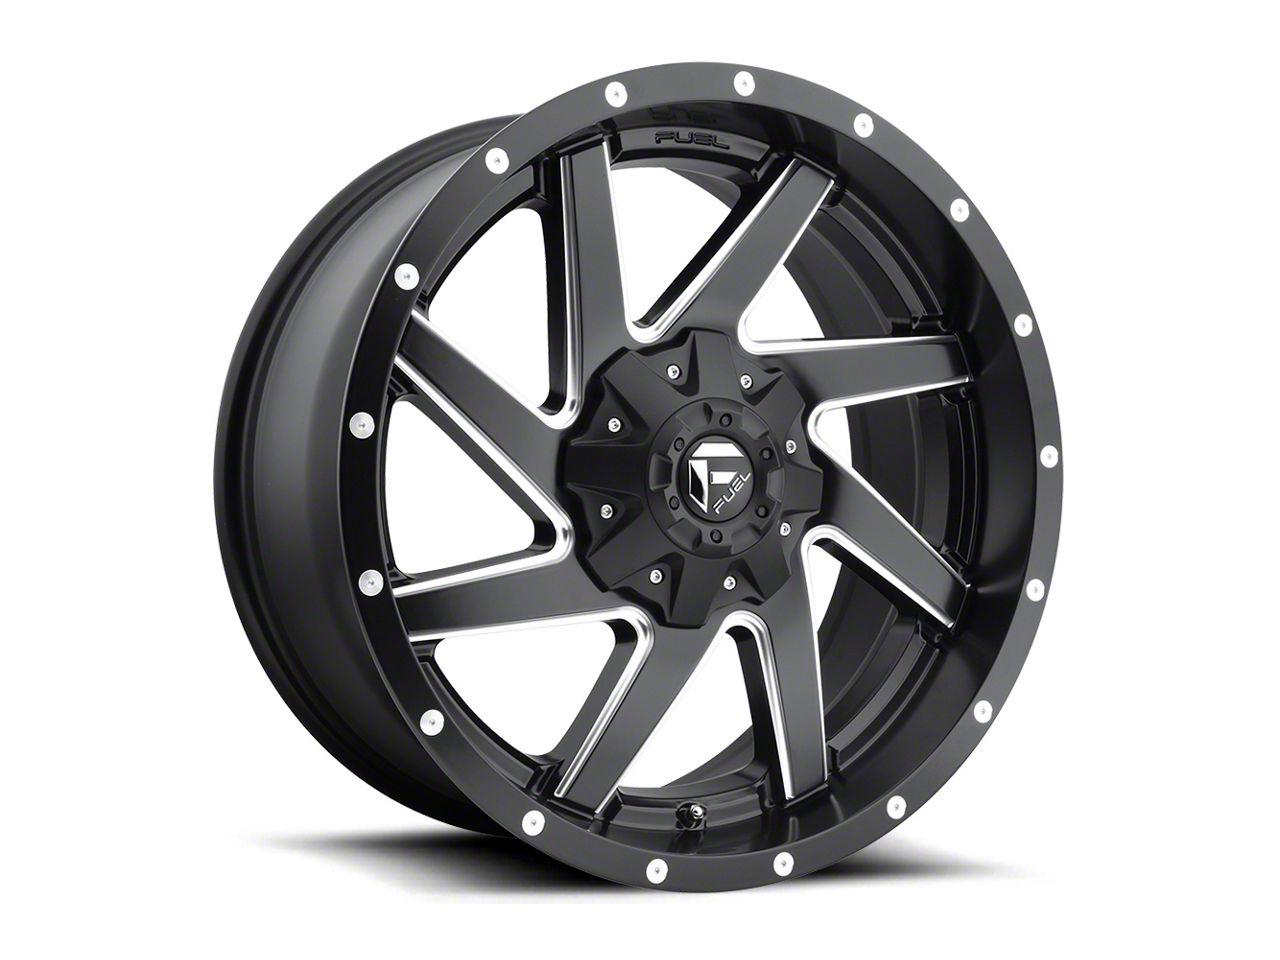 Fuel Wheels Renegade Matte Black Milled 5-Lug Wheel - 20x9 (02-18 RAM 1500, Excluding Mega Cab)